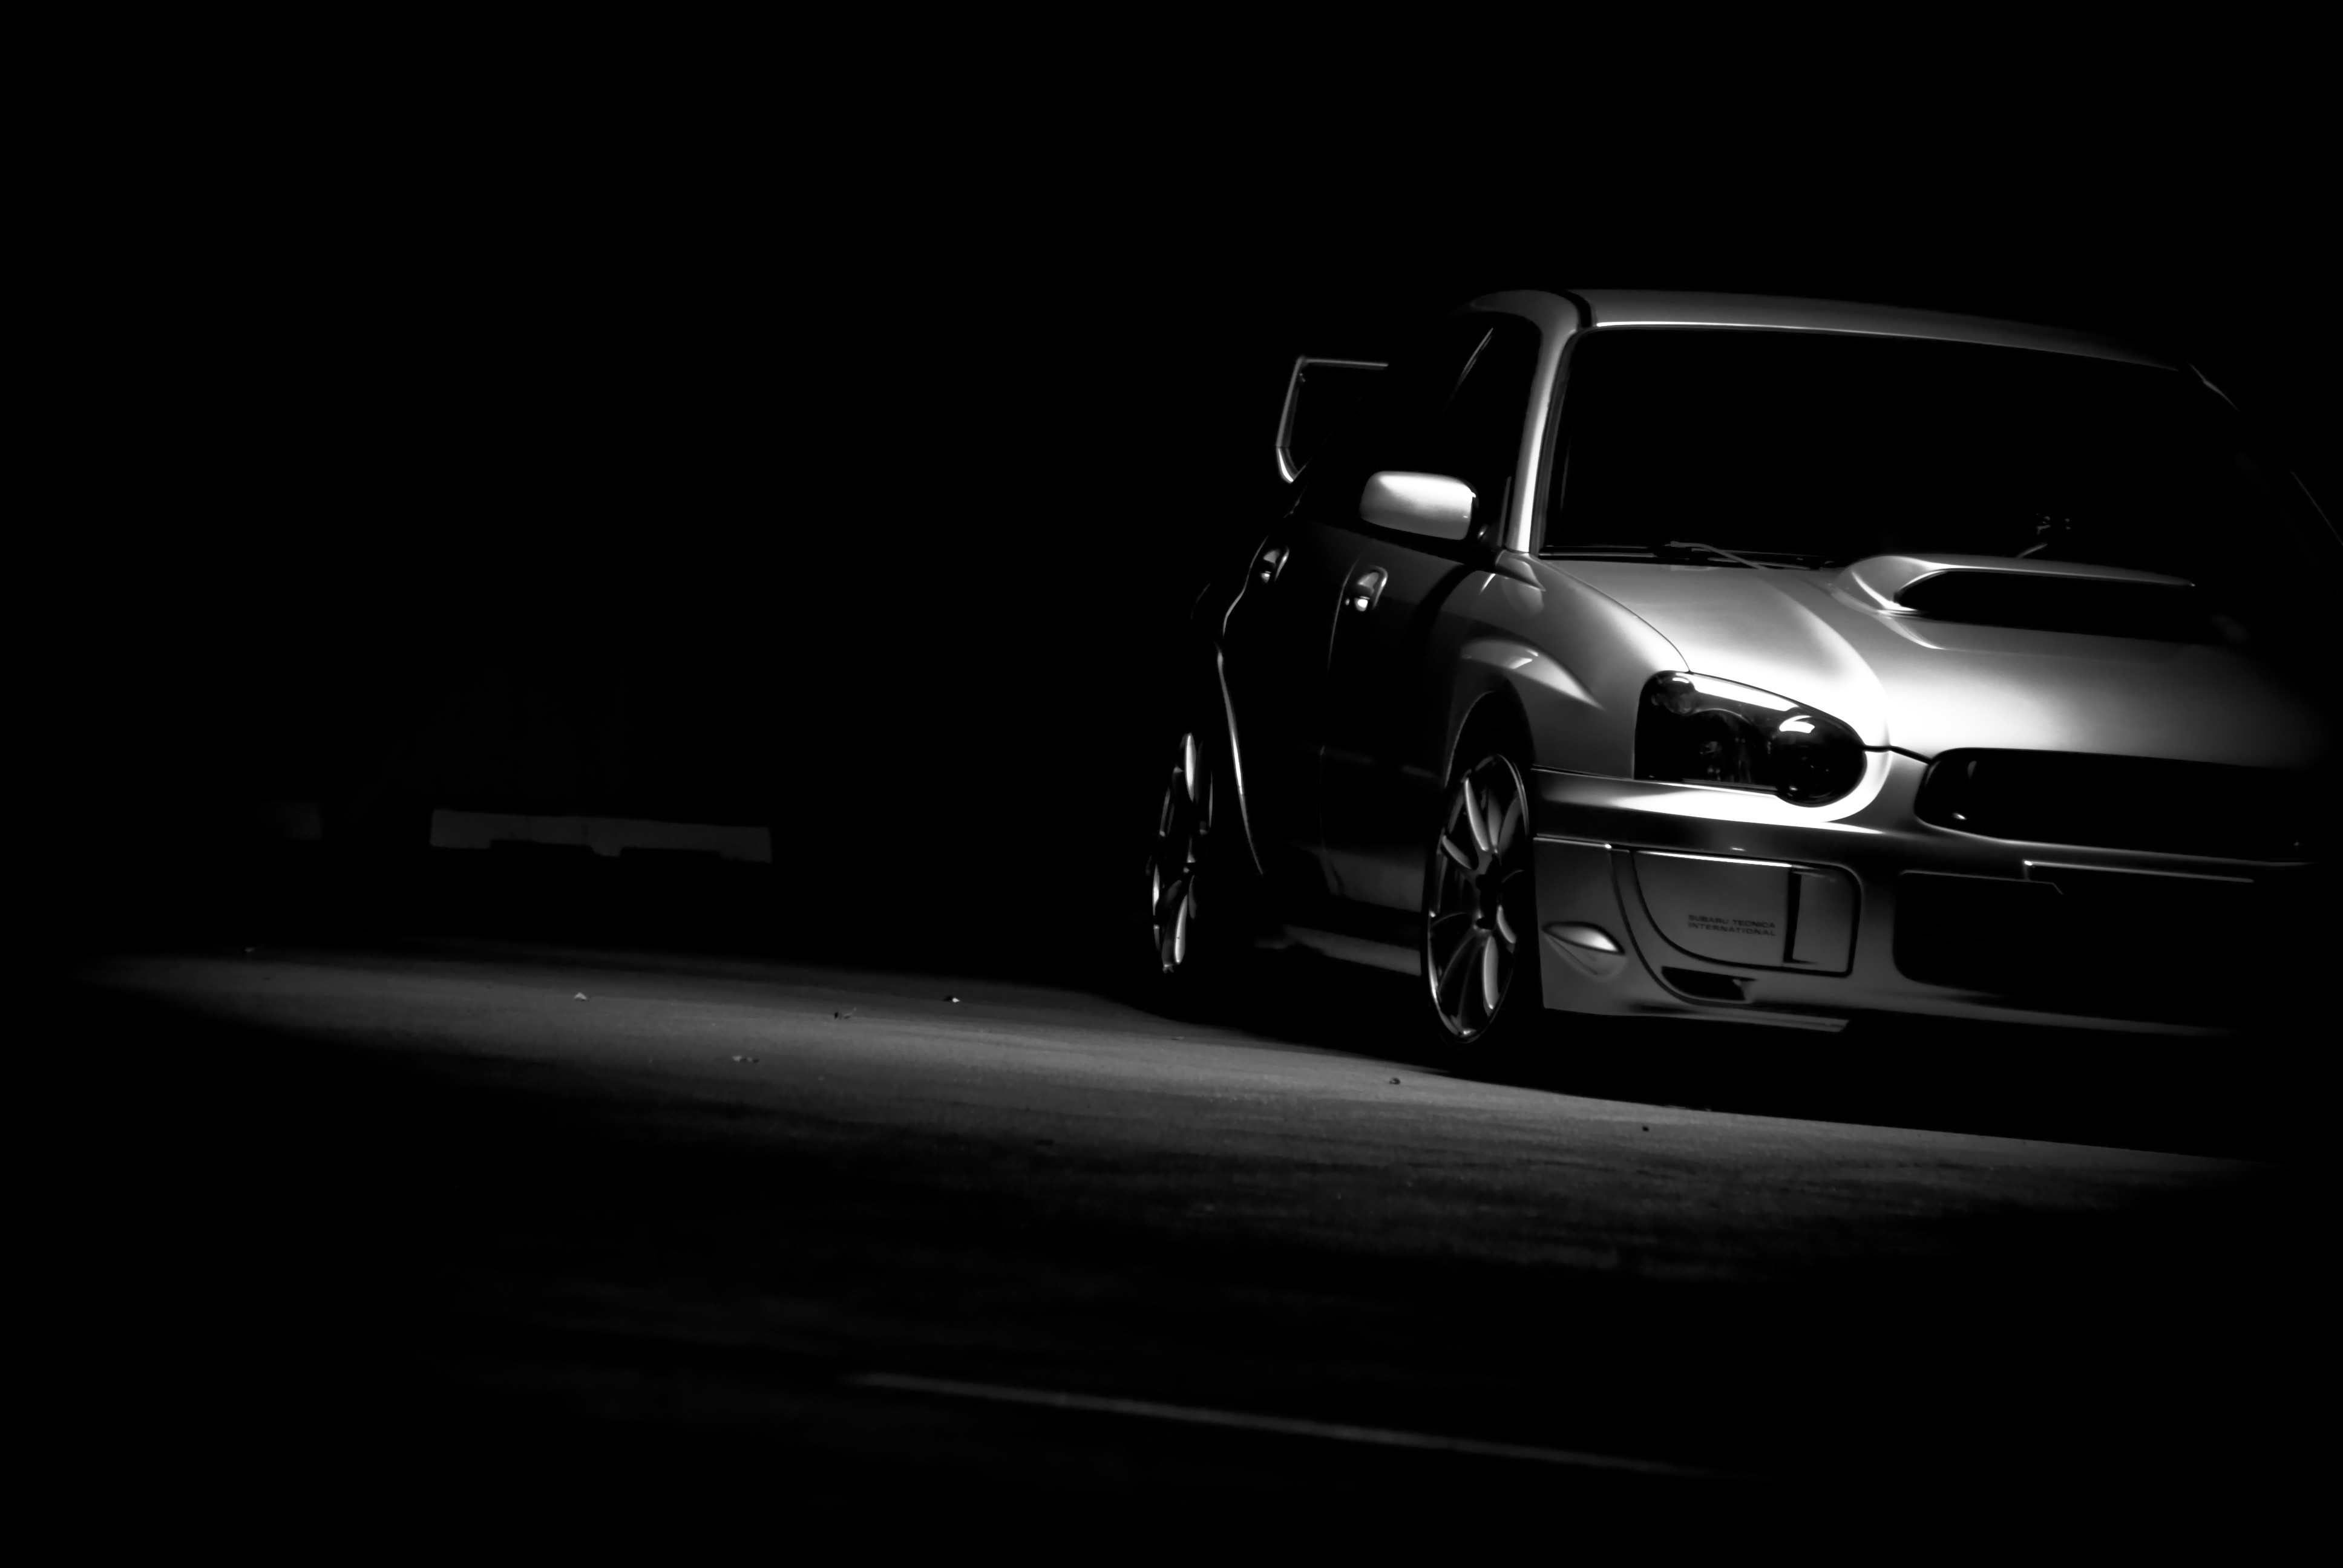 Subaru 4k Ultra HD Wallpaper | Background Image | 3872x2592 | ID:190893 - Wallpaper Abyss